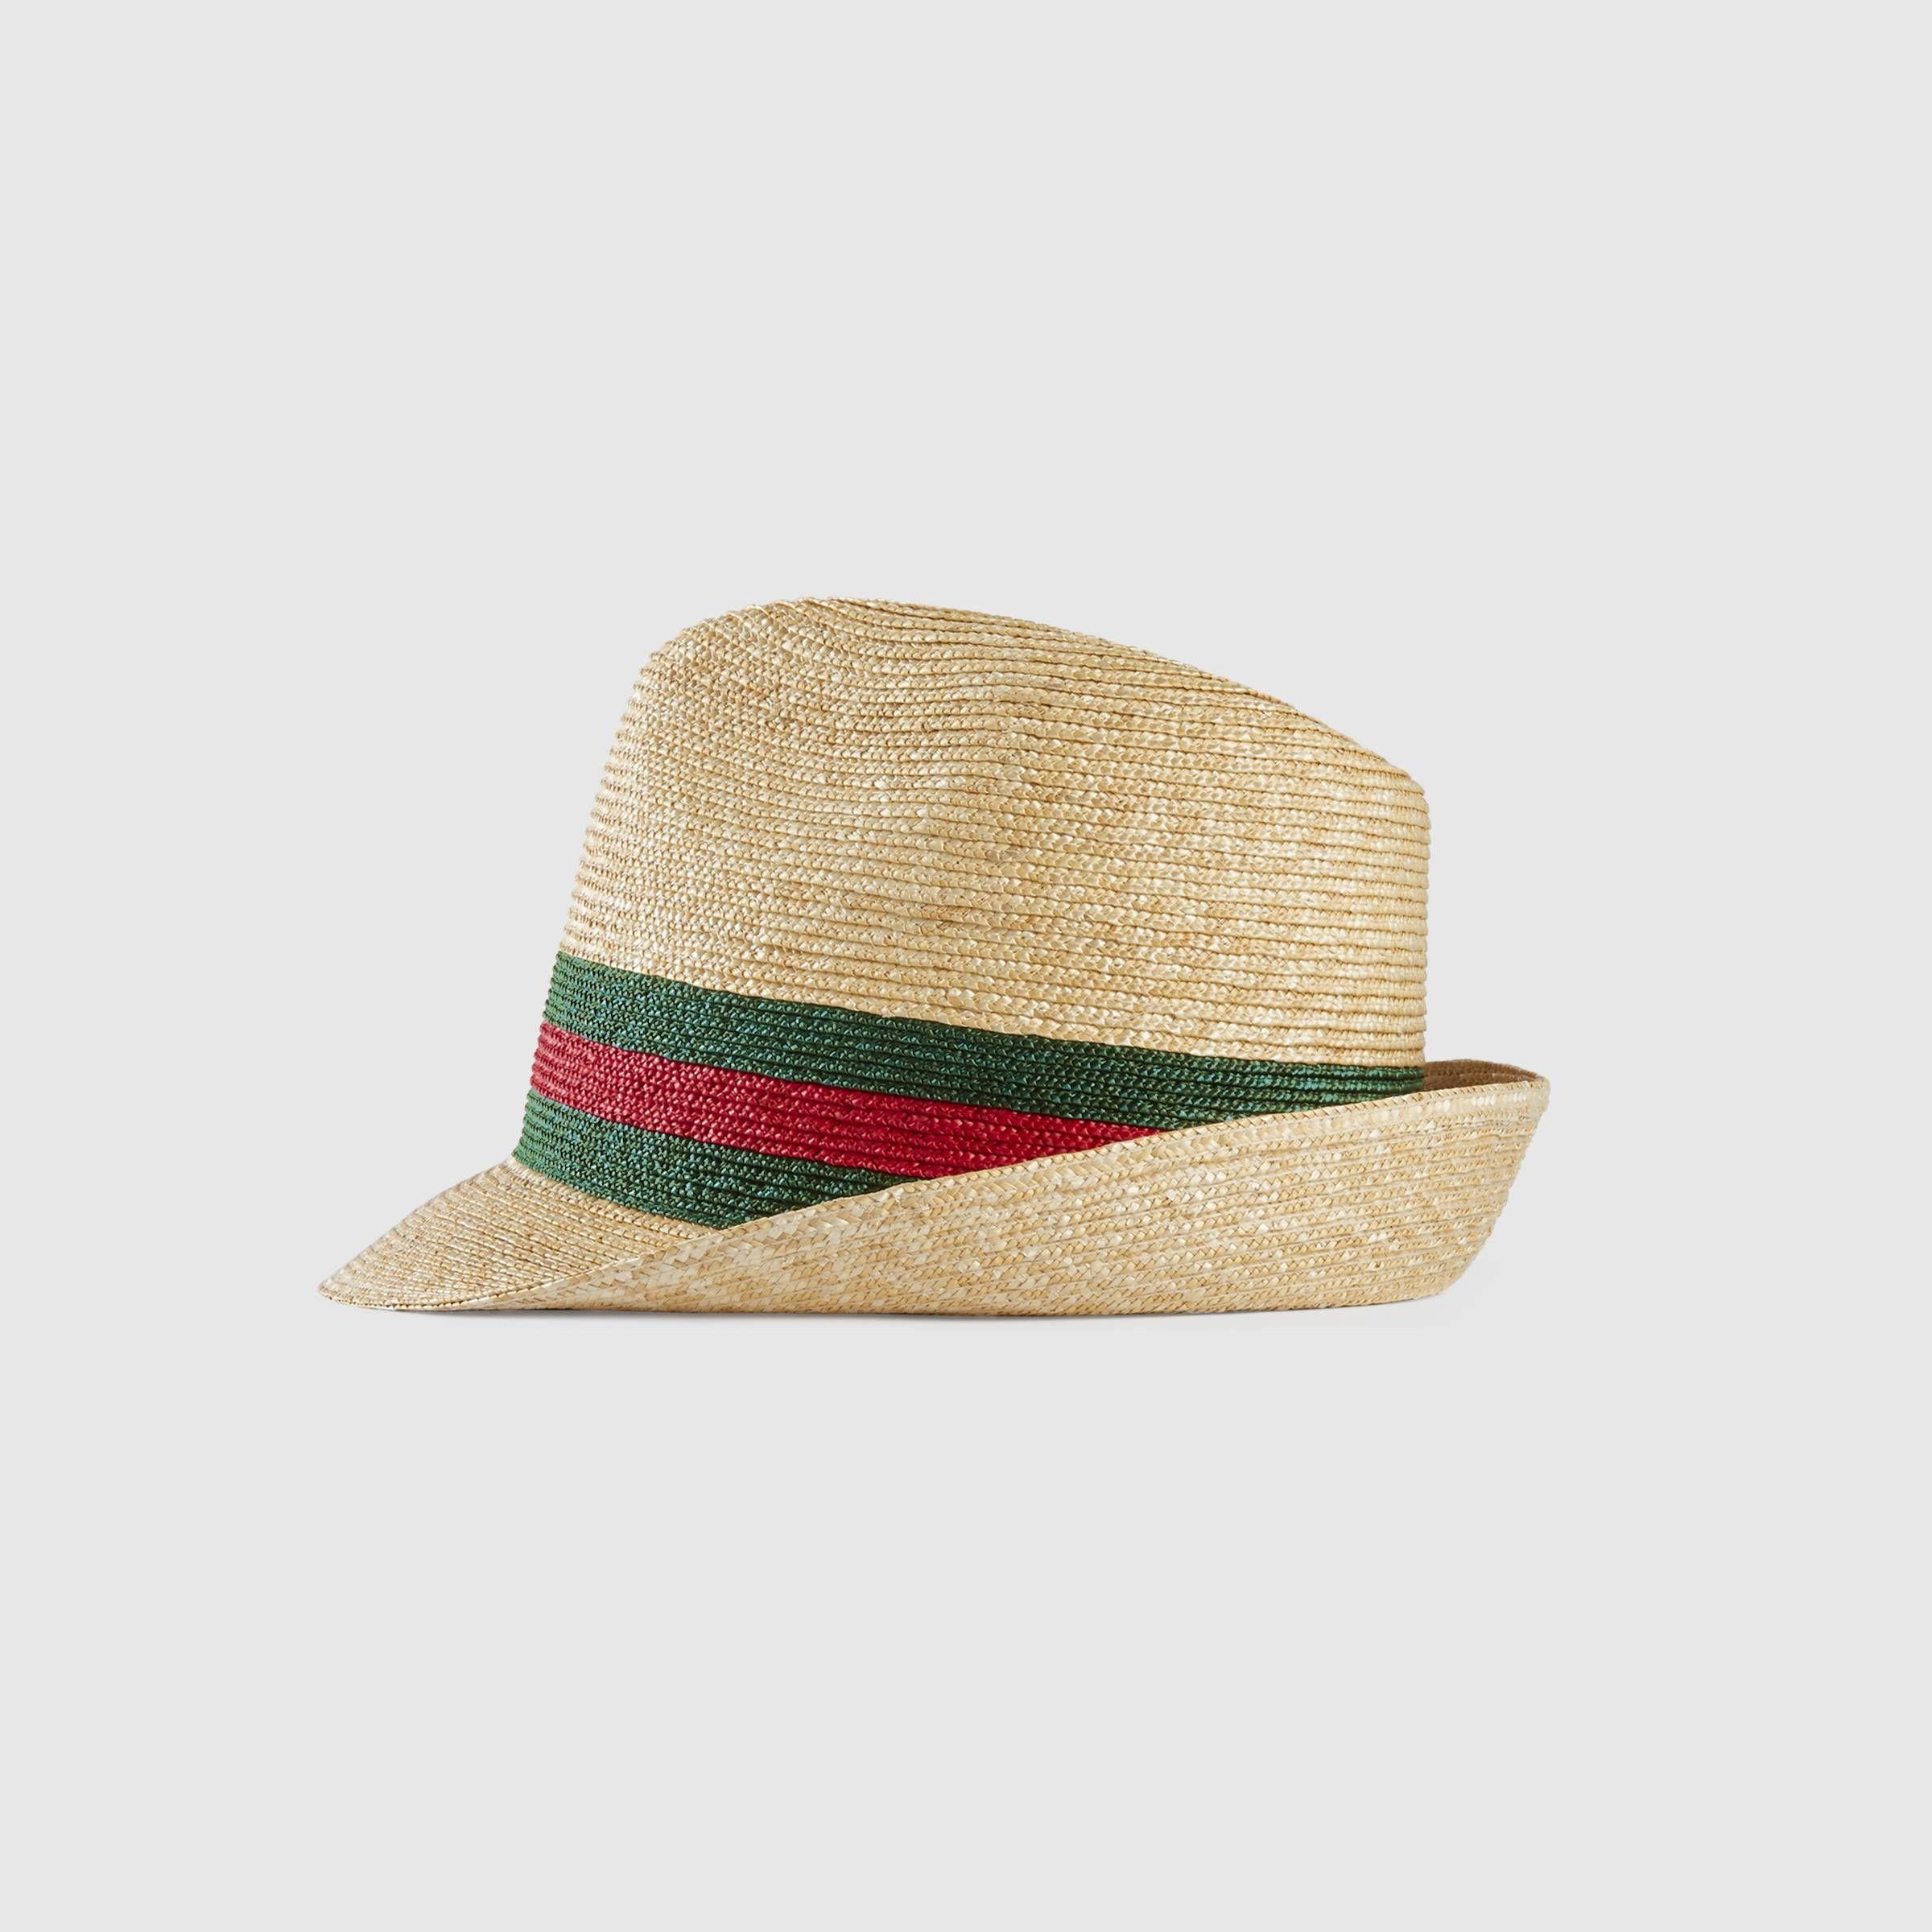 Woven straw fedora in Beige woven straw with dark green stripe  b20cac64866c